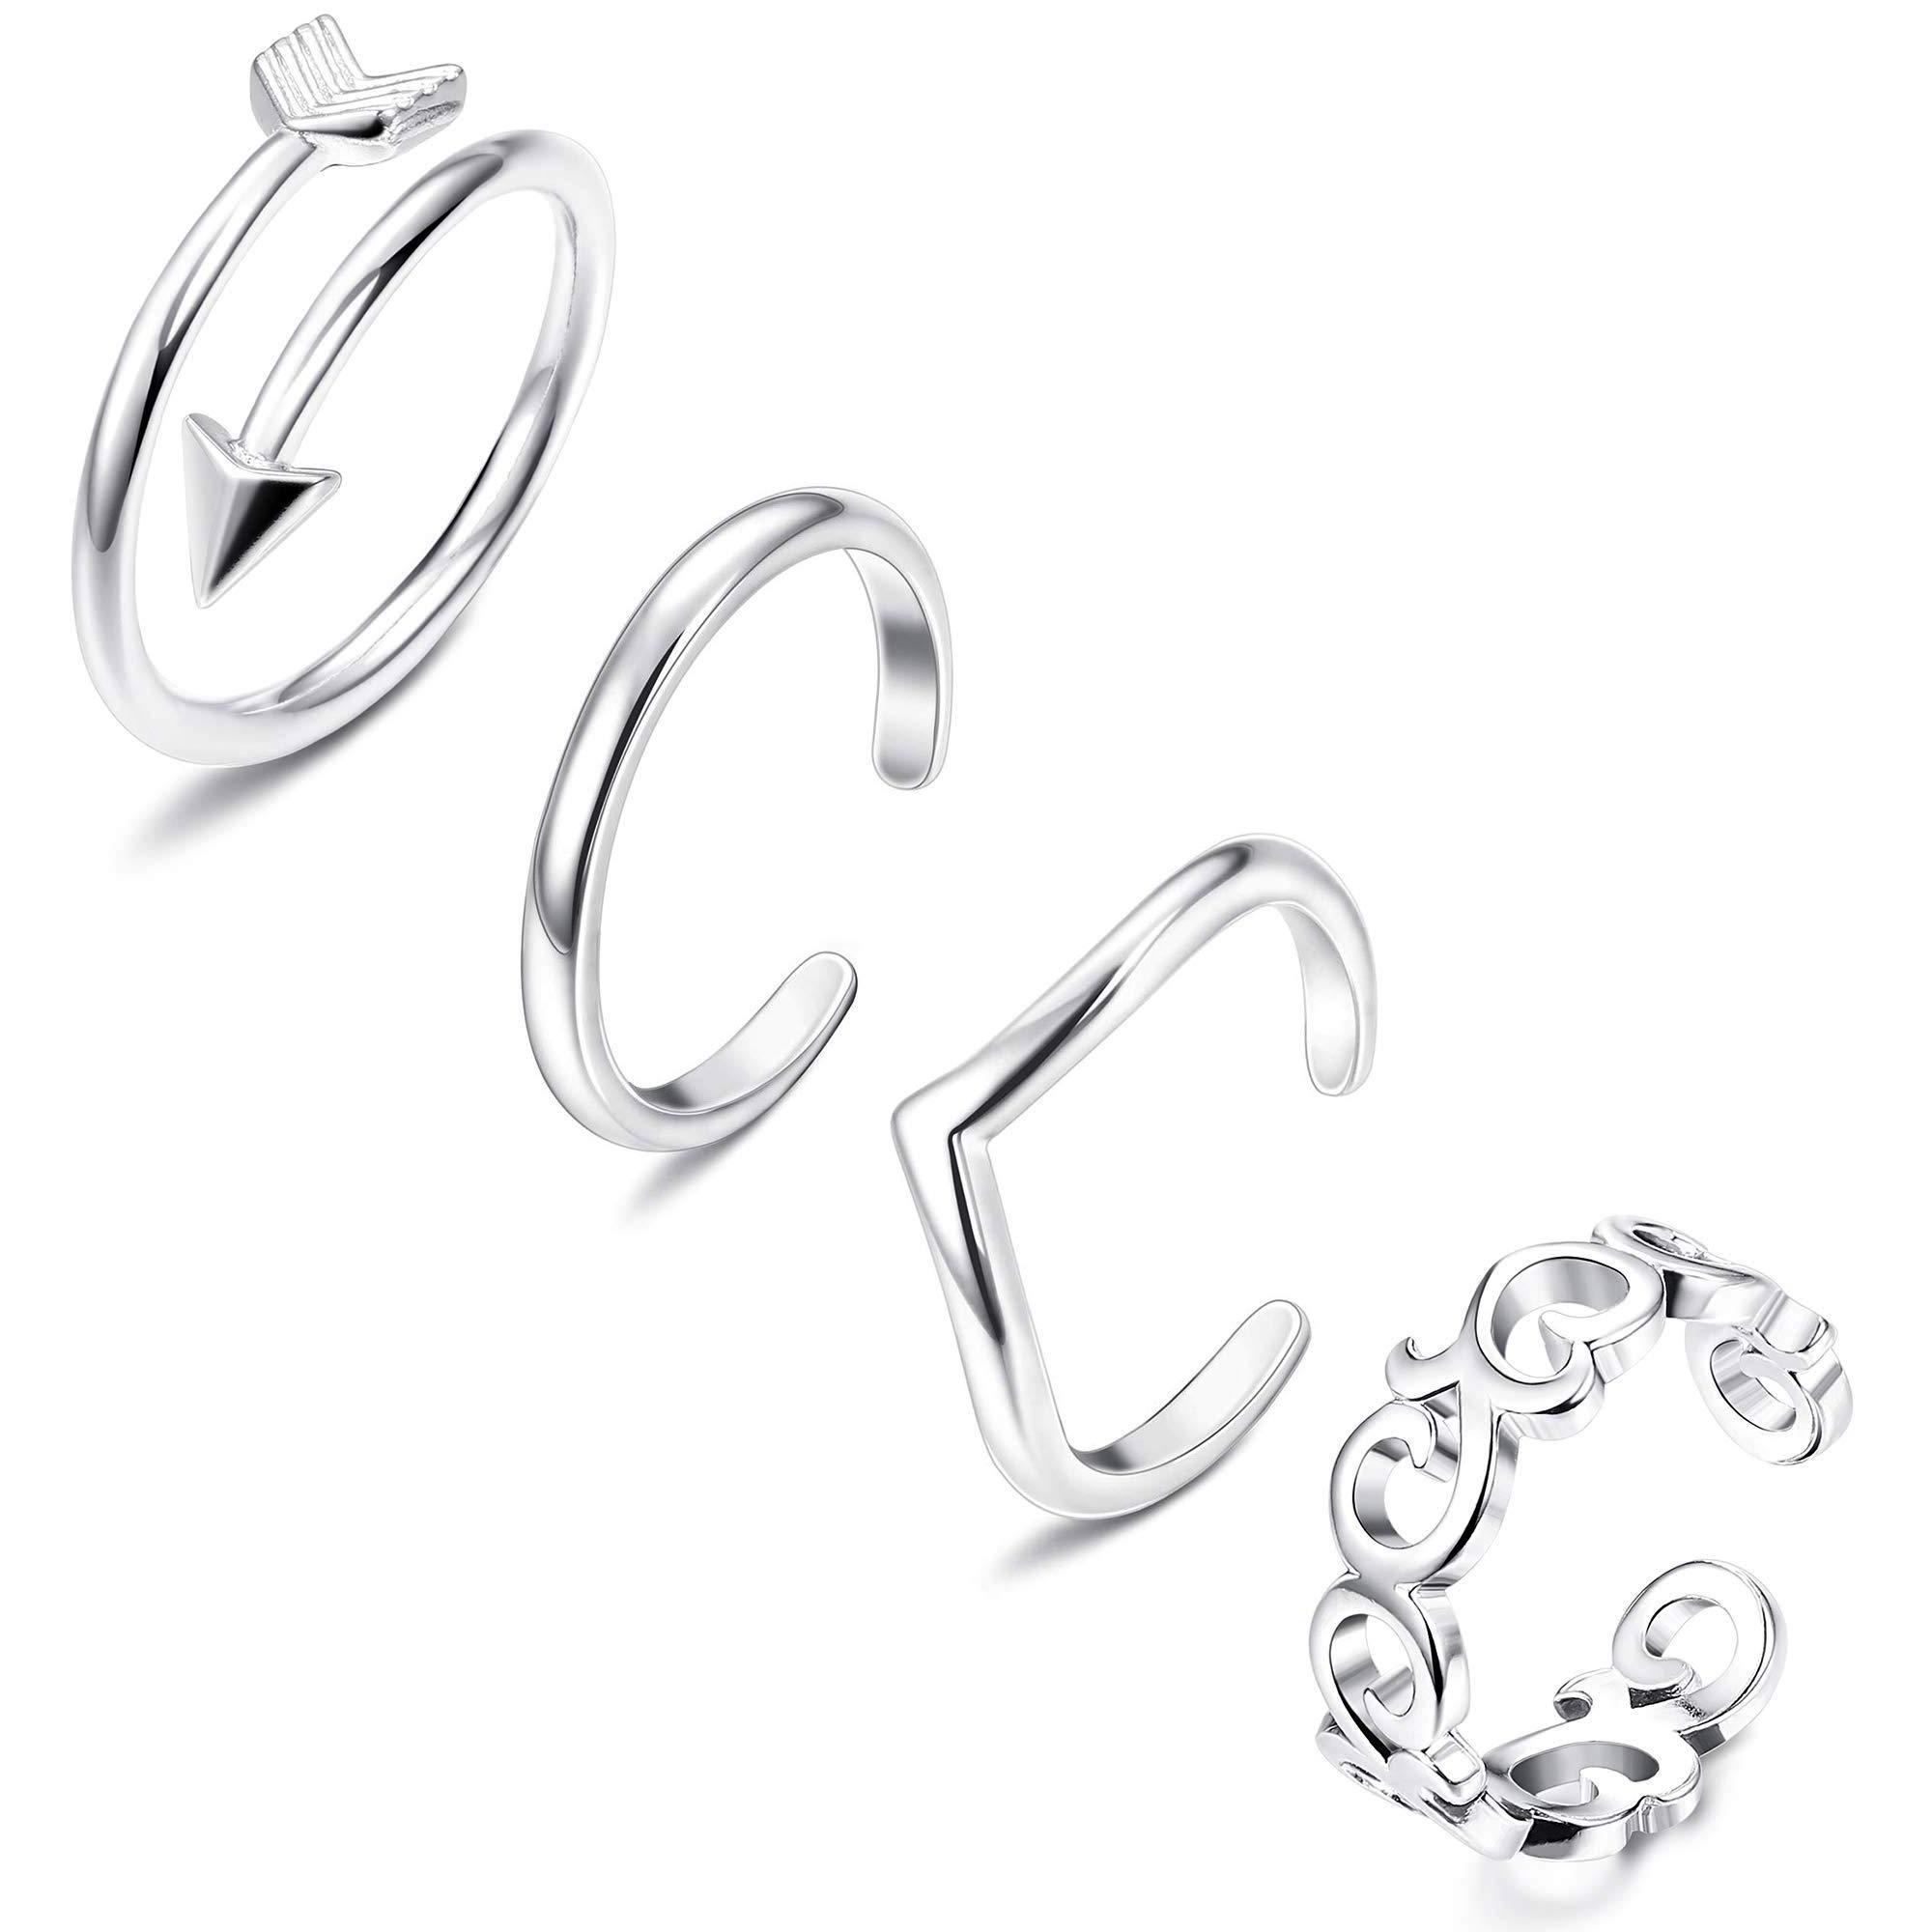 FIBO STEEL 3-18 Pcs Open Toe Rings for Women Arrow Tail Band Toe Ring Adjustable